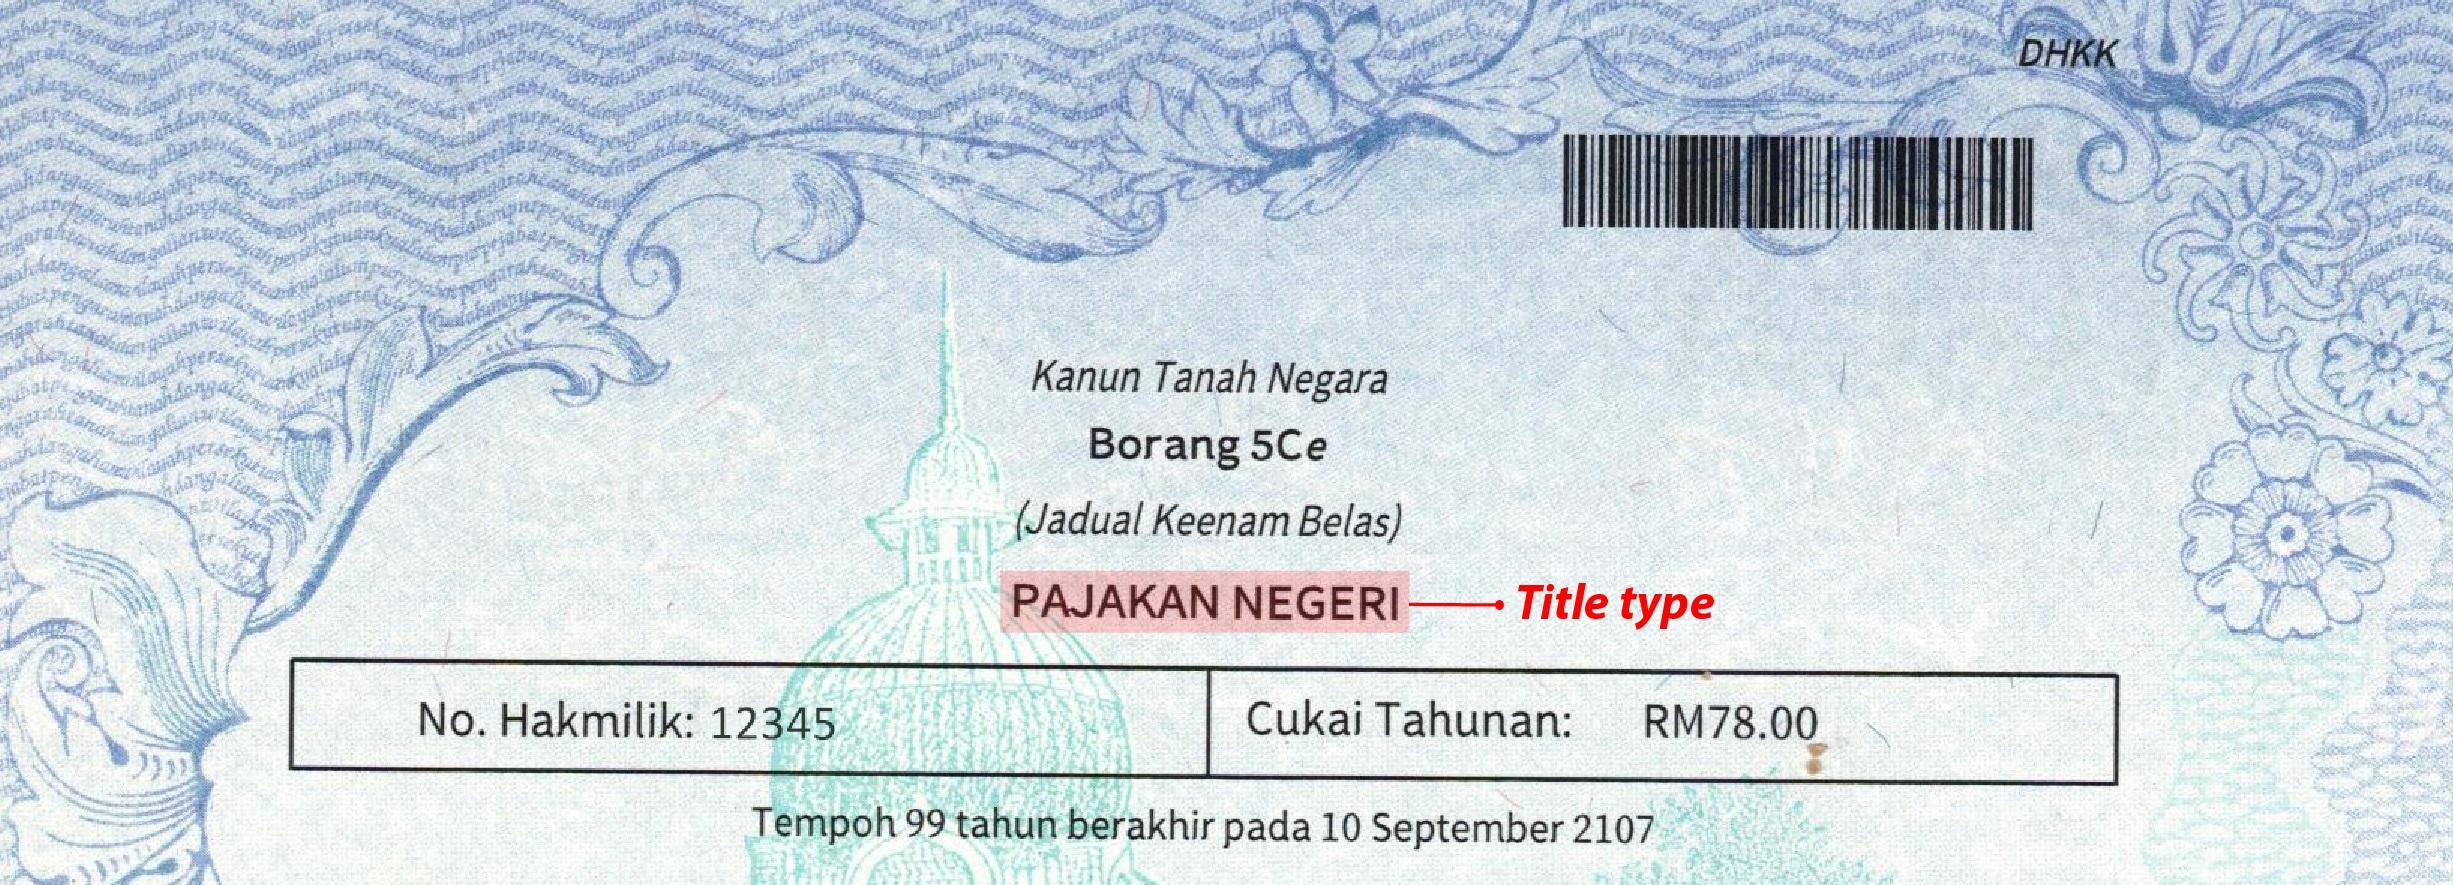 Title Type